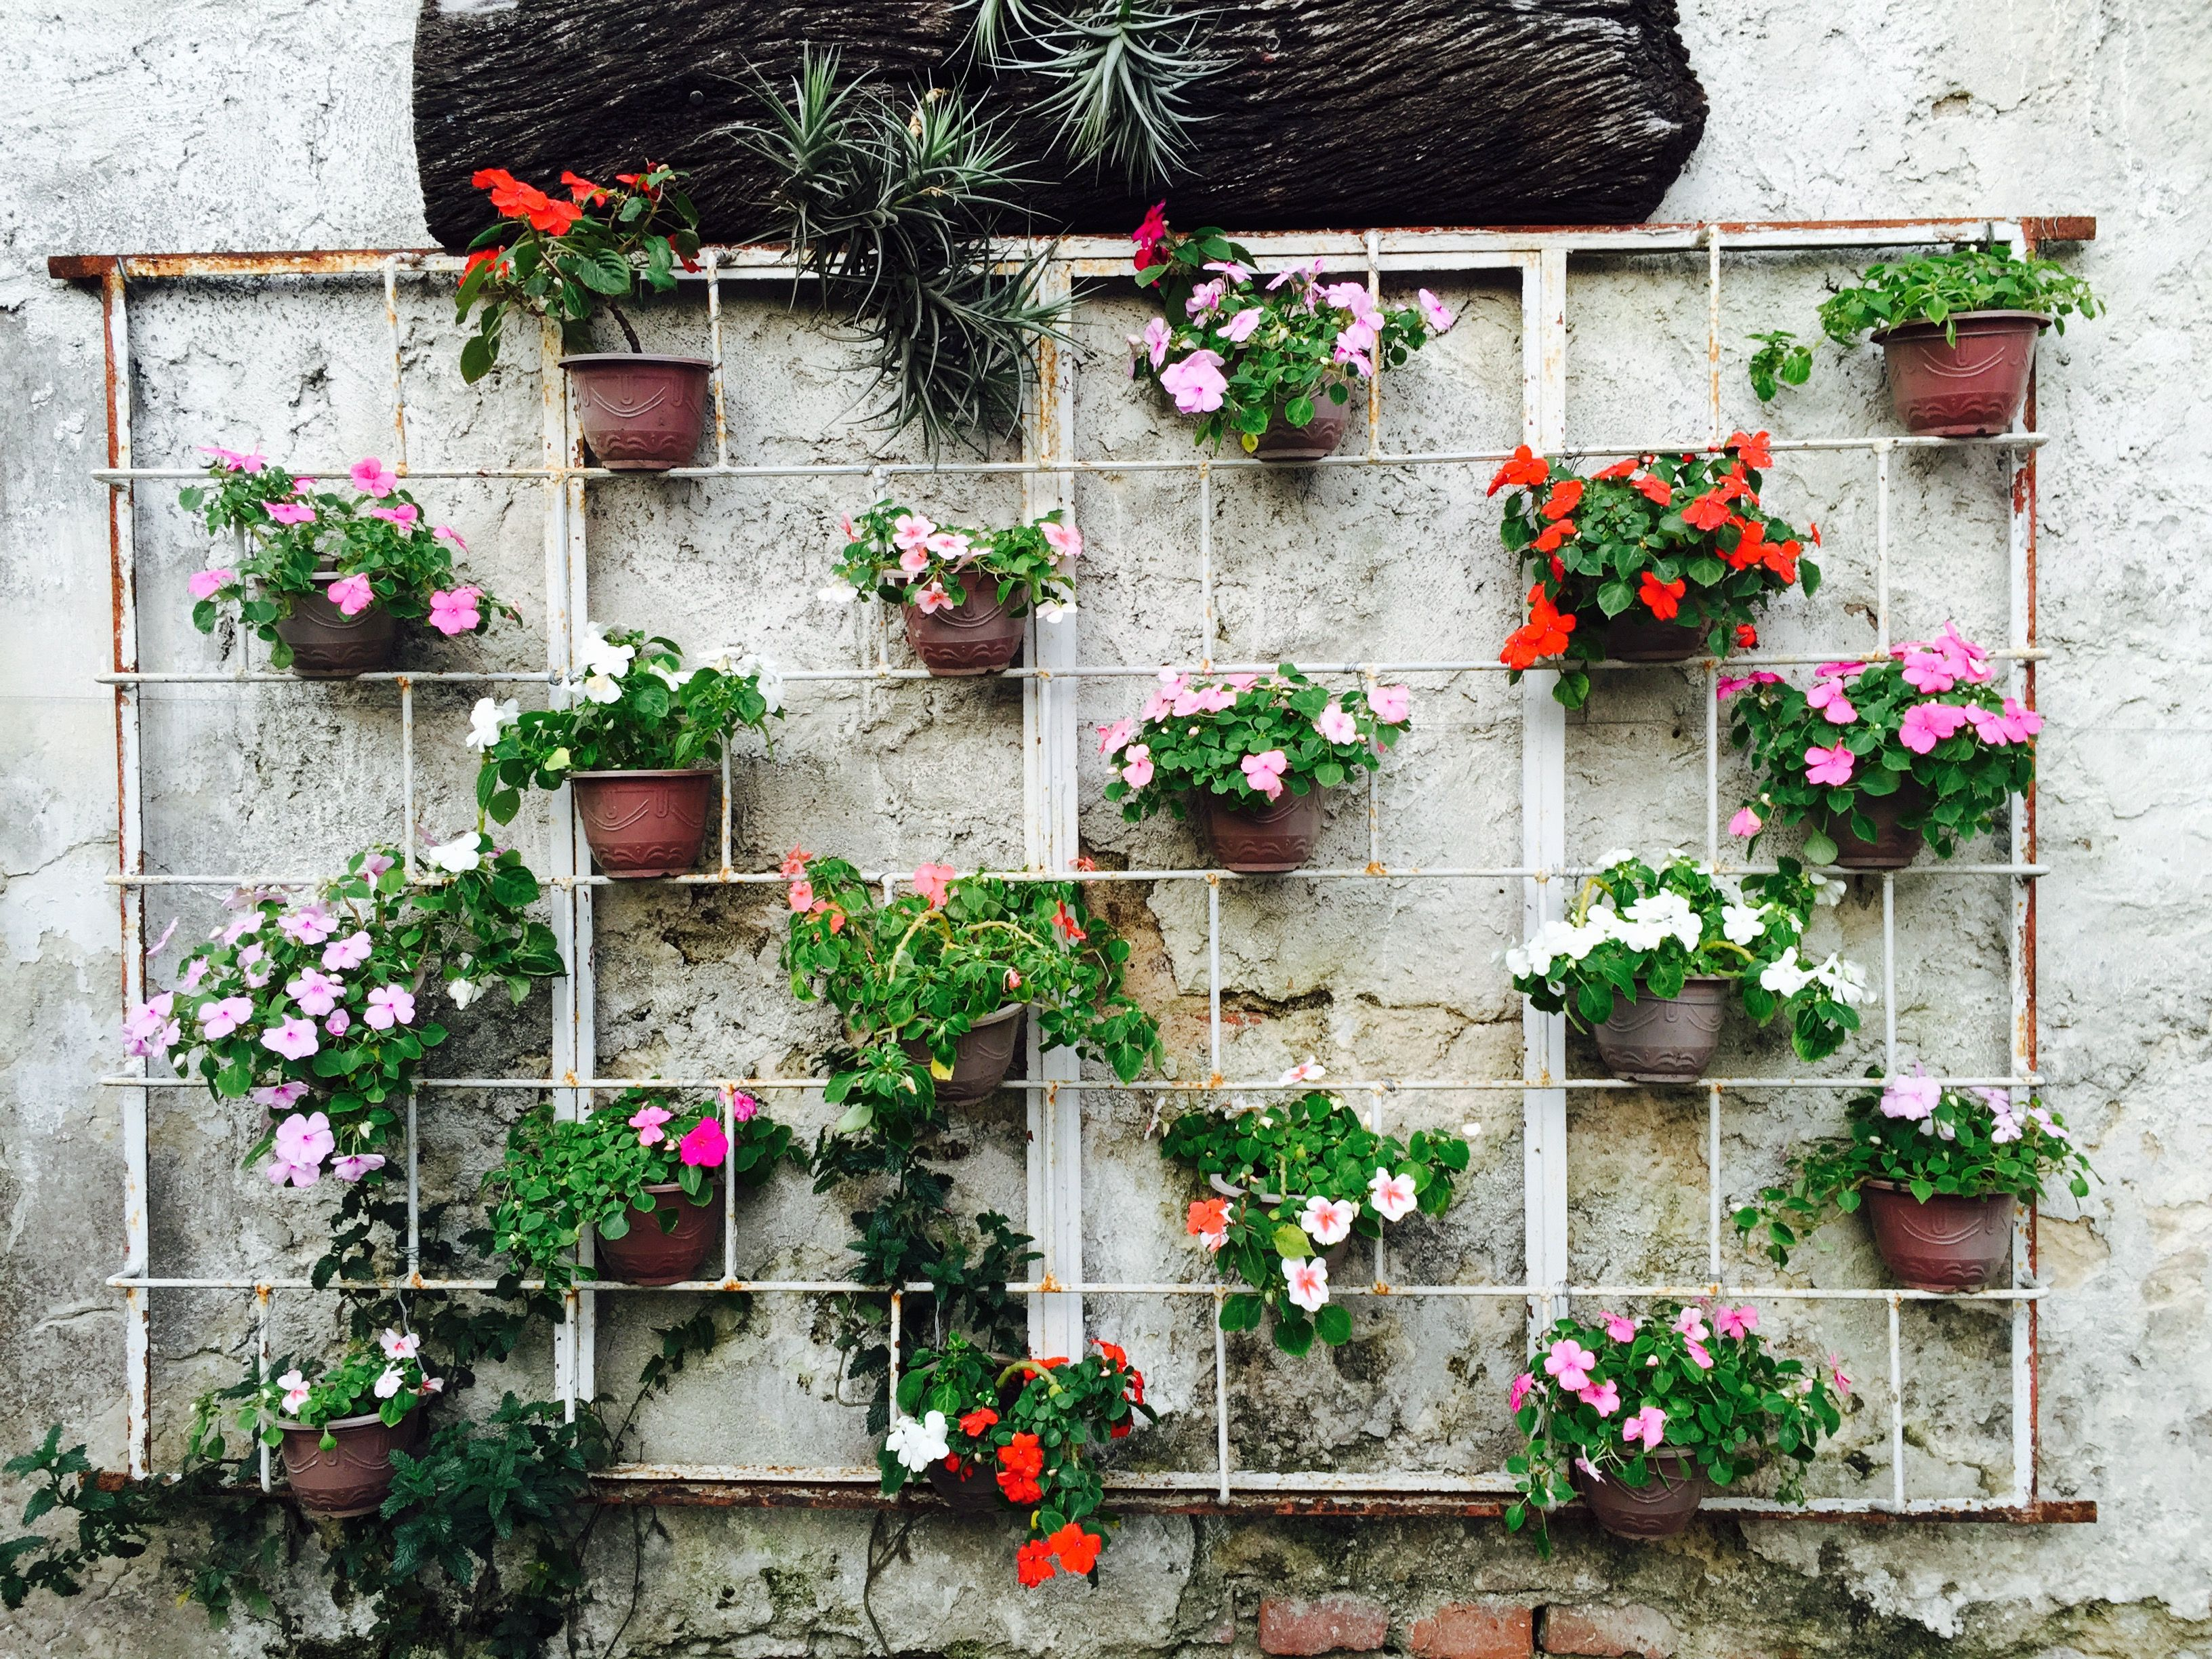 Ventana vieja reutilizada para colgar macetas con alegr as plantas plantas macetas y - Macetas en la pared ...